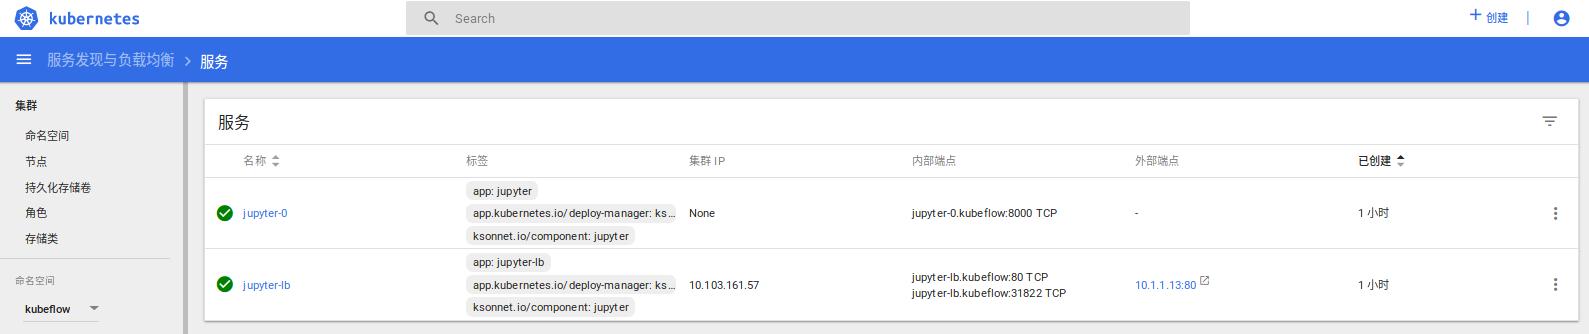 Kubeflow更新升级到0 4 1 - 豌豆ip代理